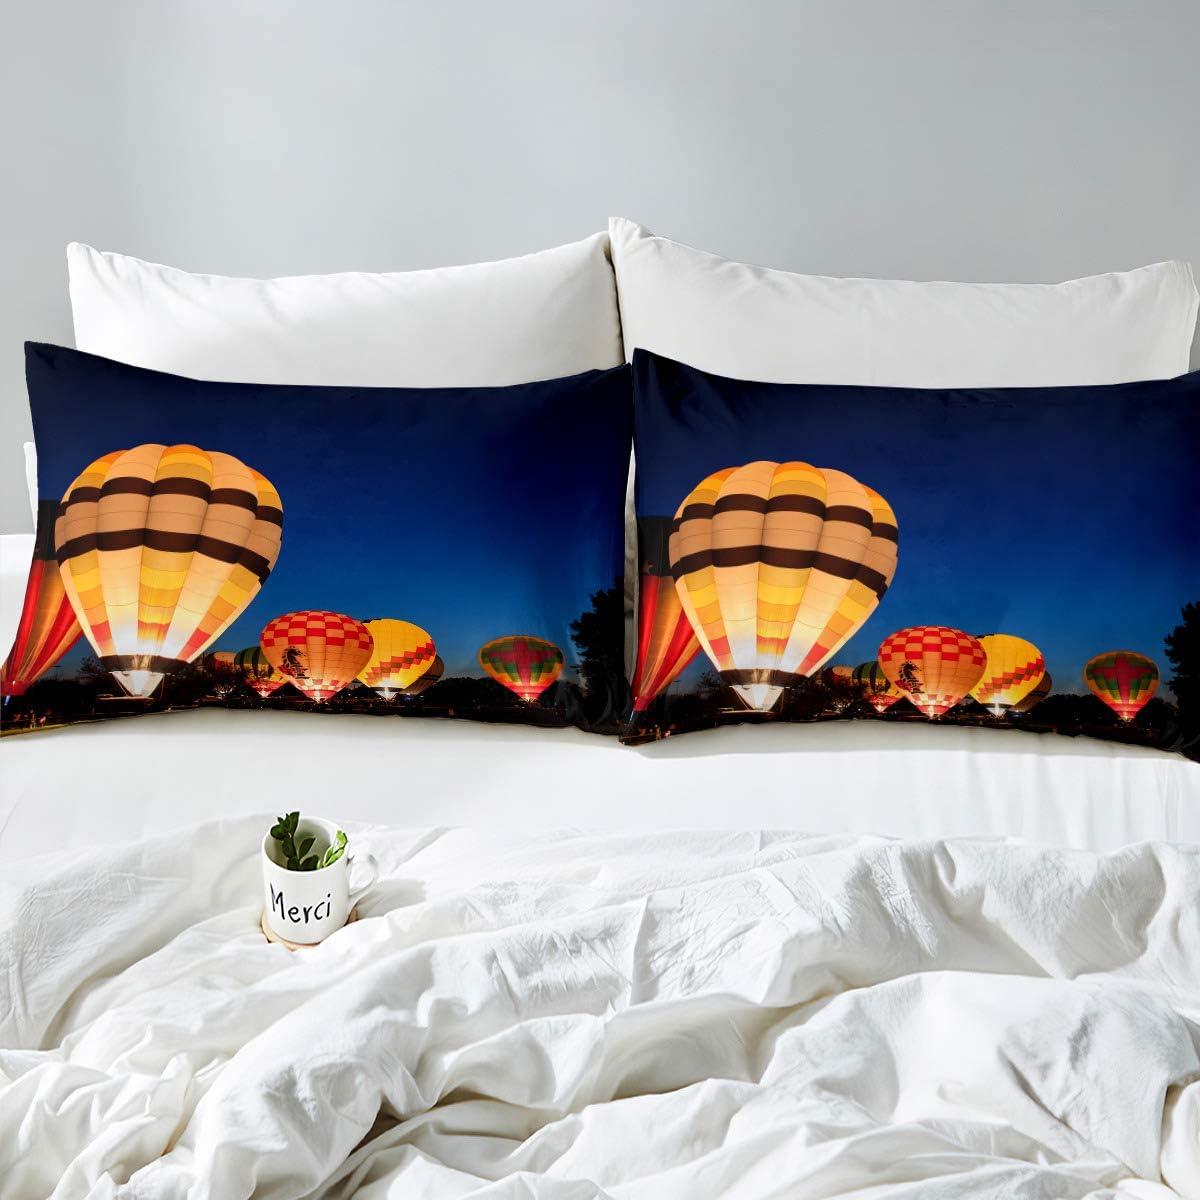 1 Fitted Sheet + 1 Pillow Case TwinXL Size Manfei Musical Bedding Set 2pcs for Kids Boys Guitar Radio Drum Kit Headset Decor Sheet Set Music Theme Fitted Sheet Microfiber Bed Sheet Set